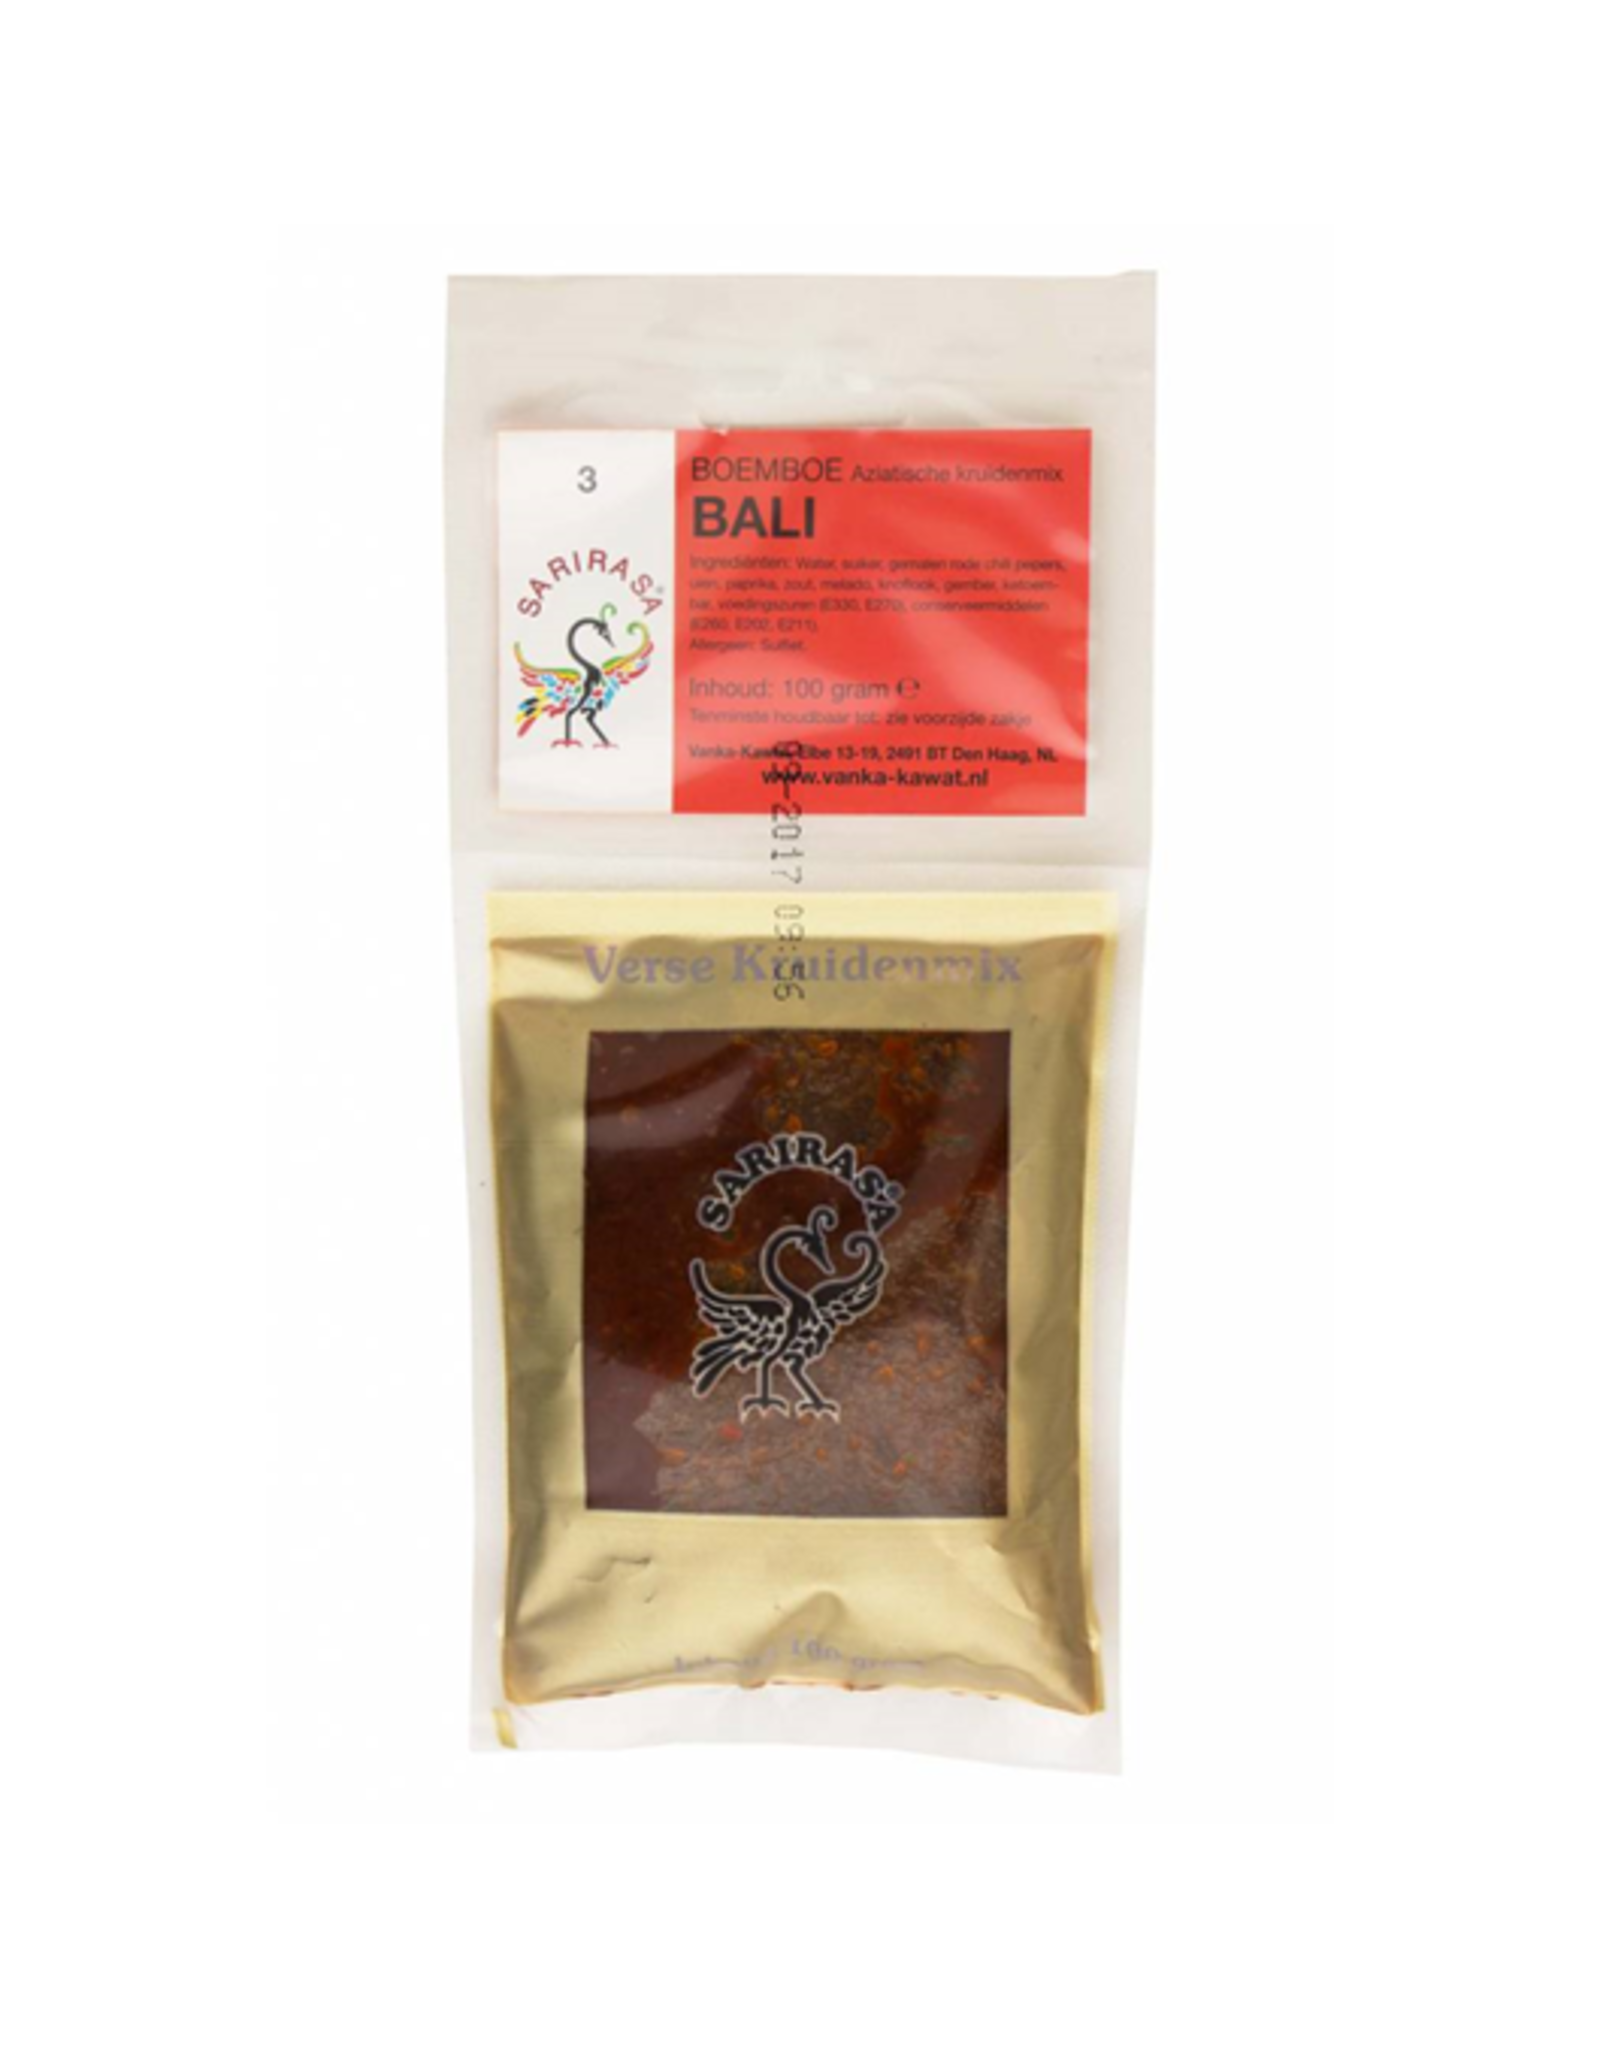 SariRasa 03 Bali